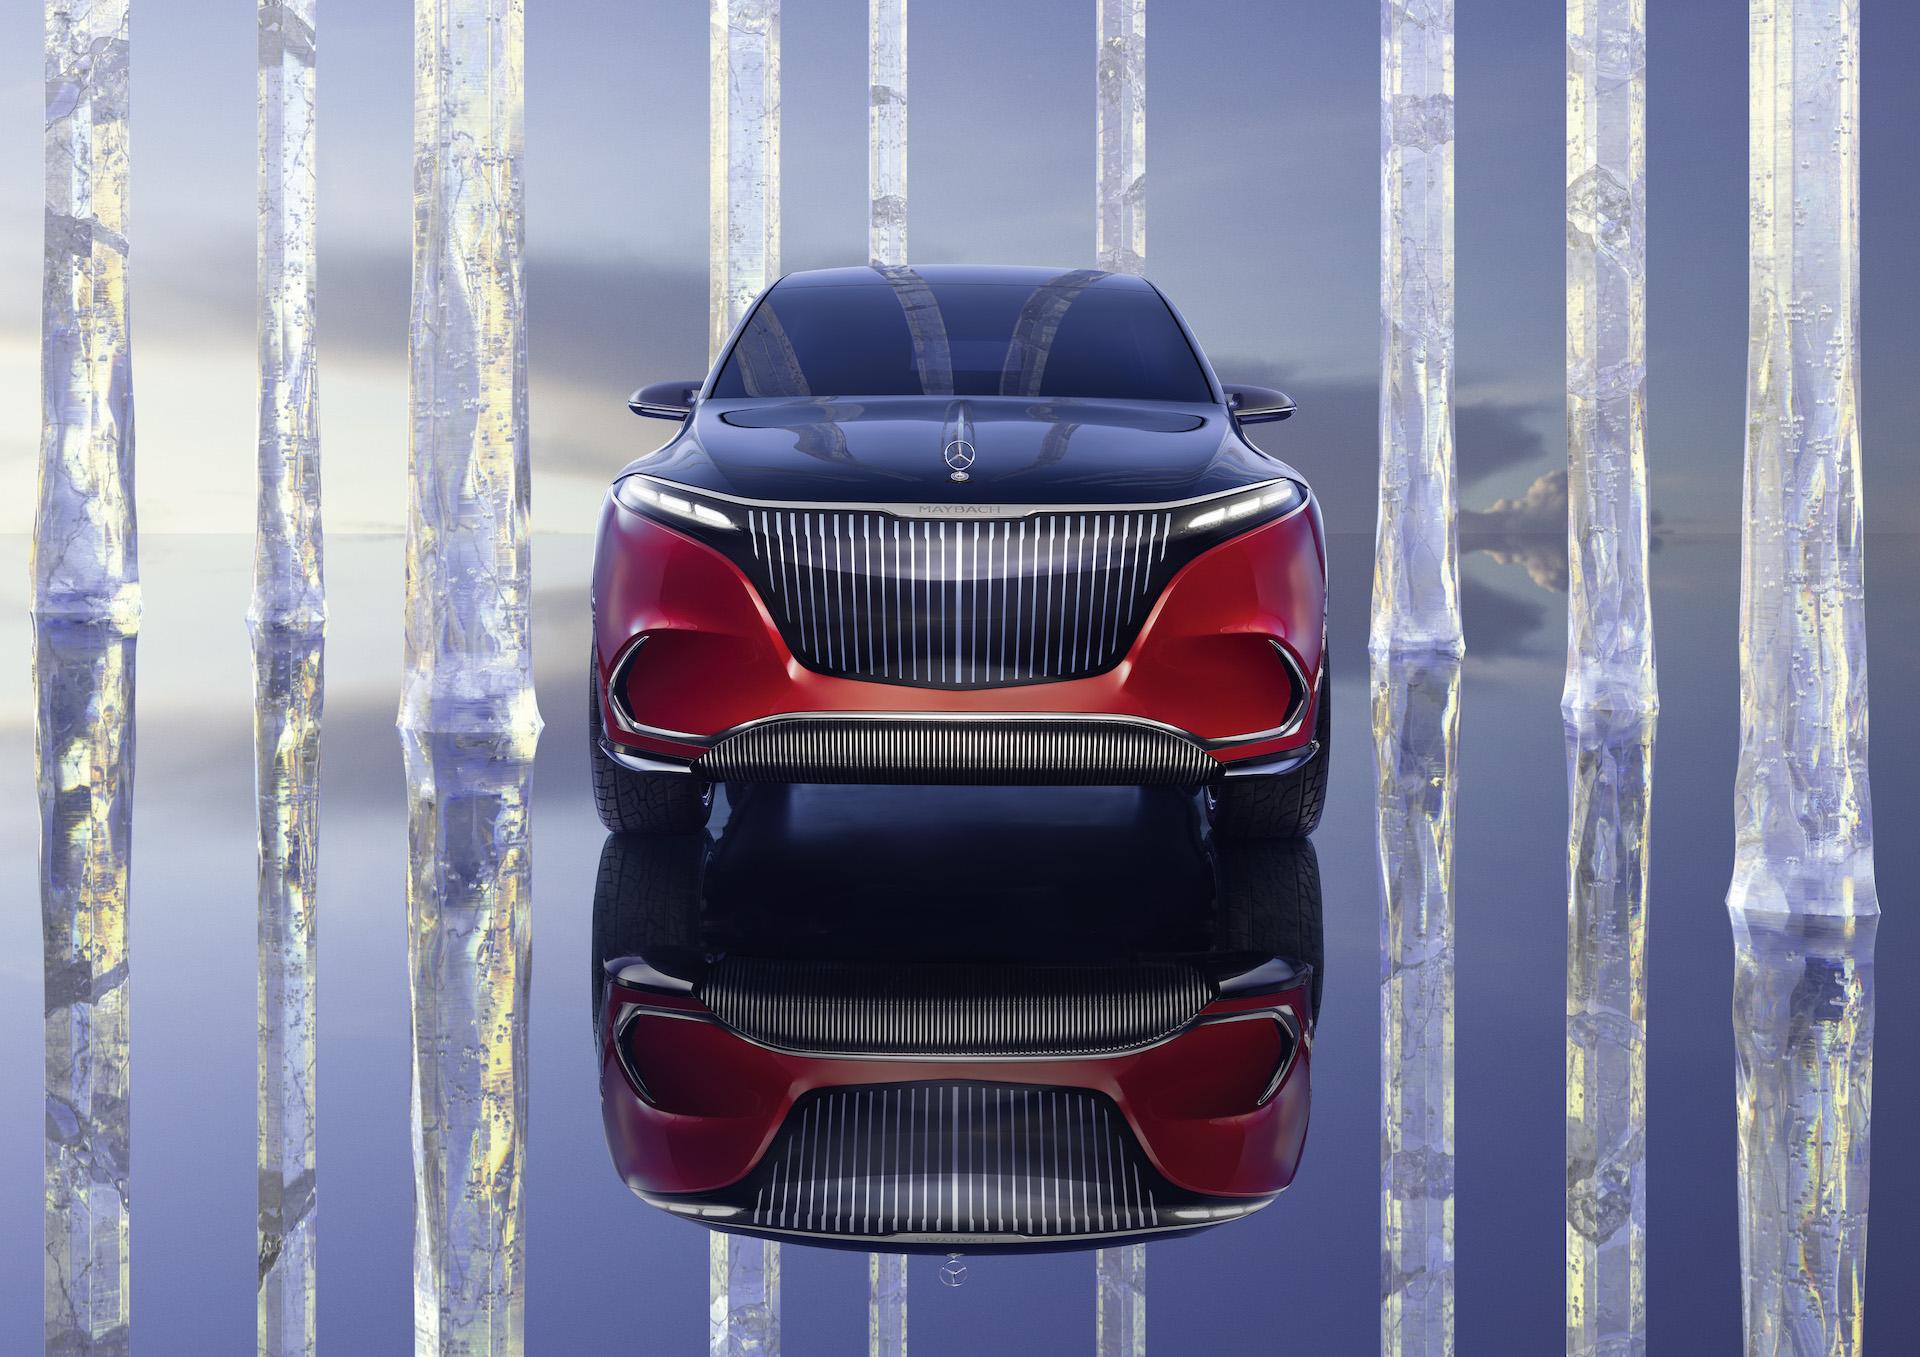 2022 Polestar 2 models reviewed, Mercedes-Maybach EQS, US EV fleet savings: Today's Car News